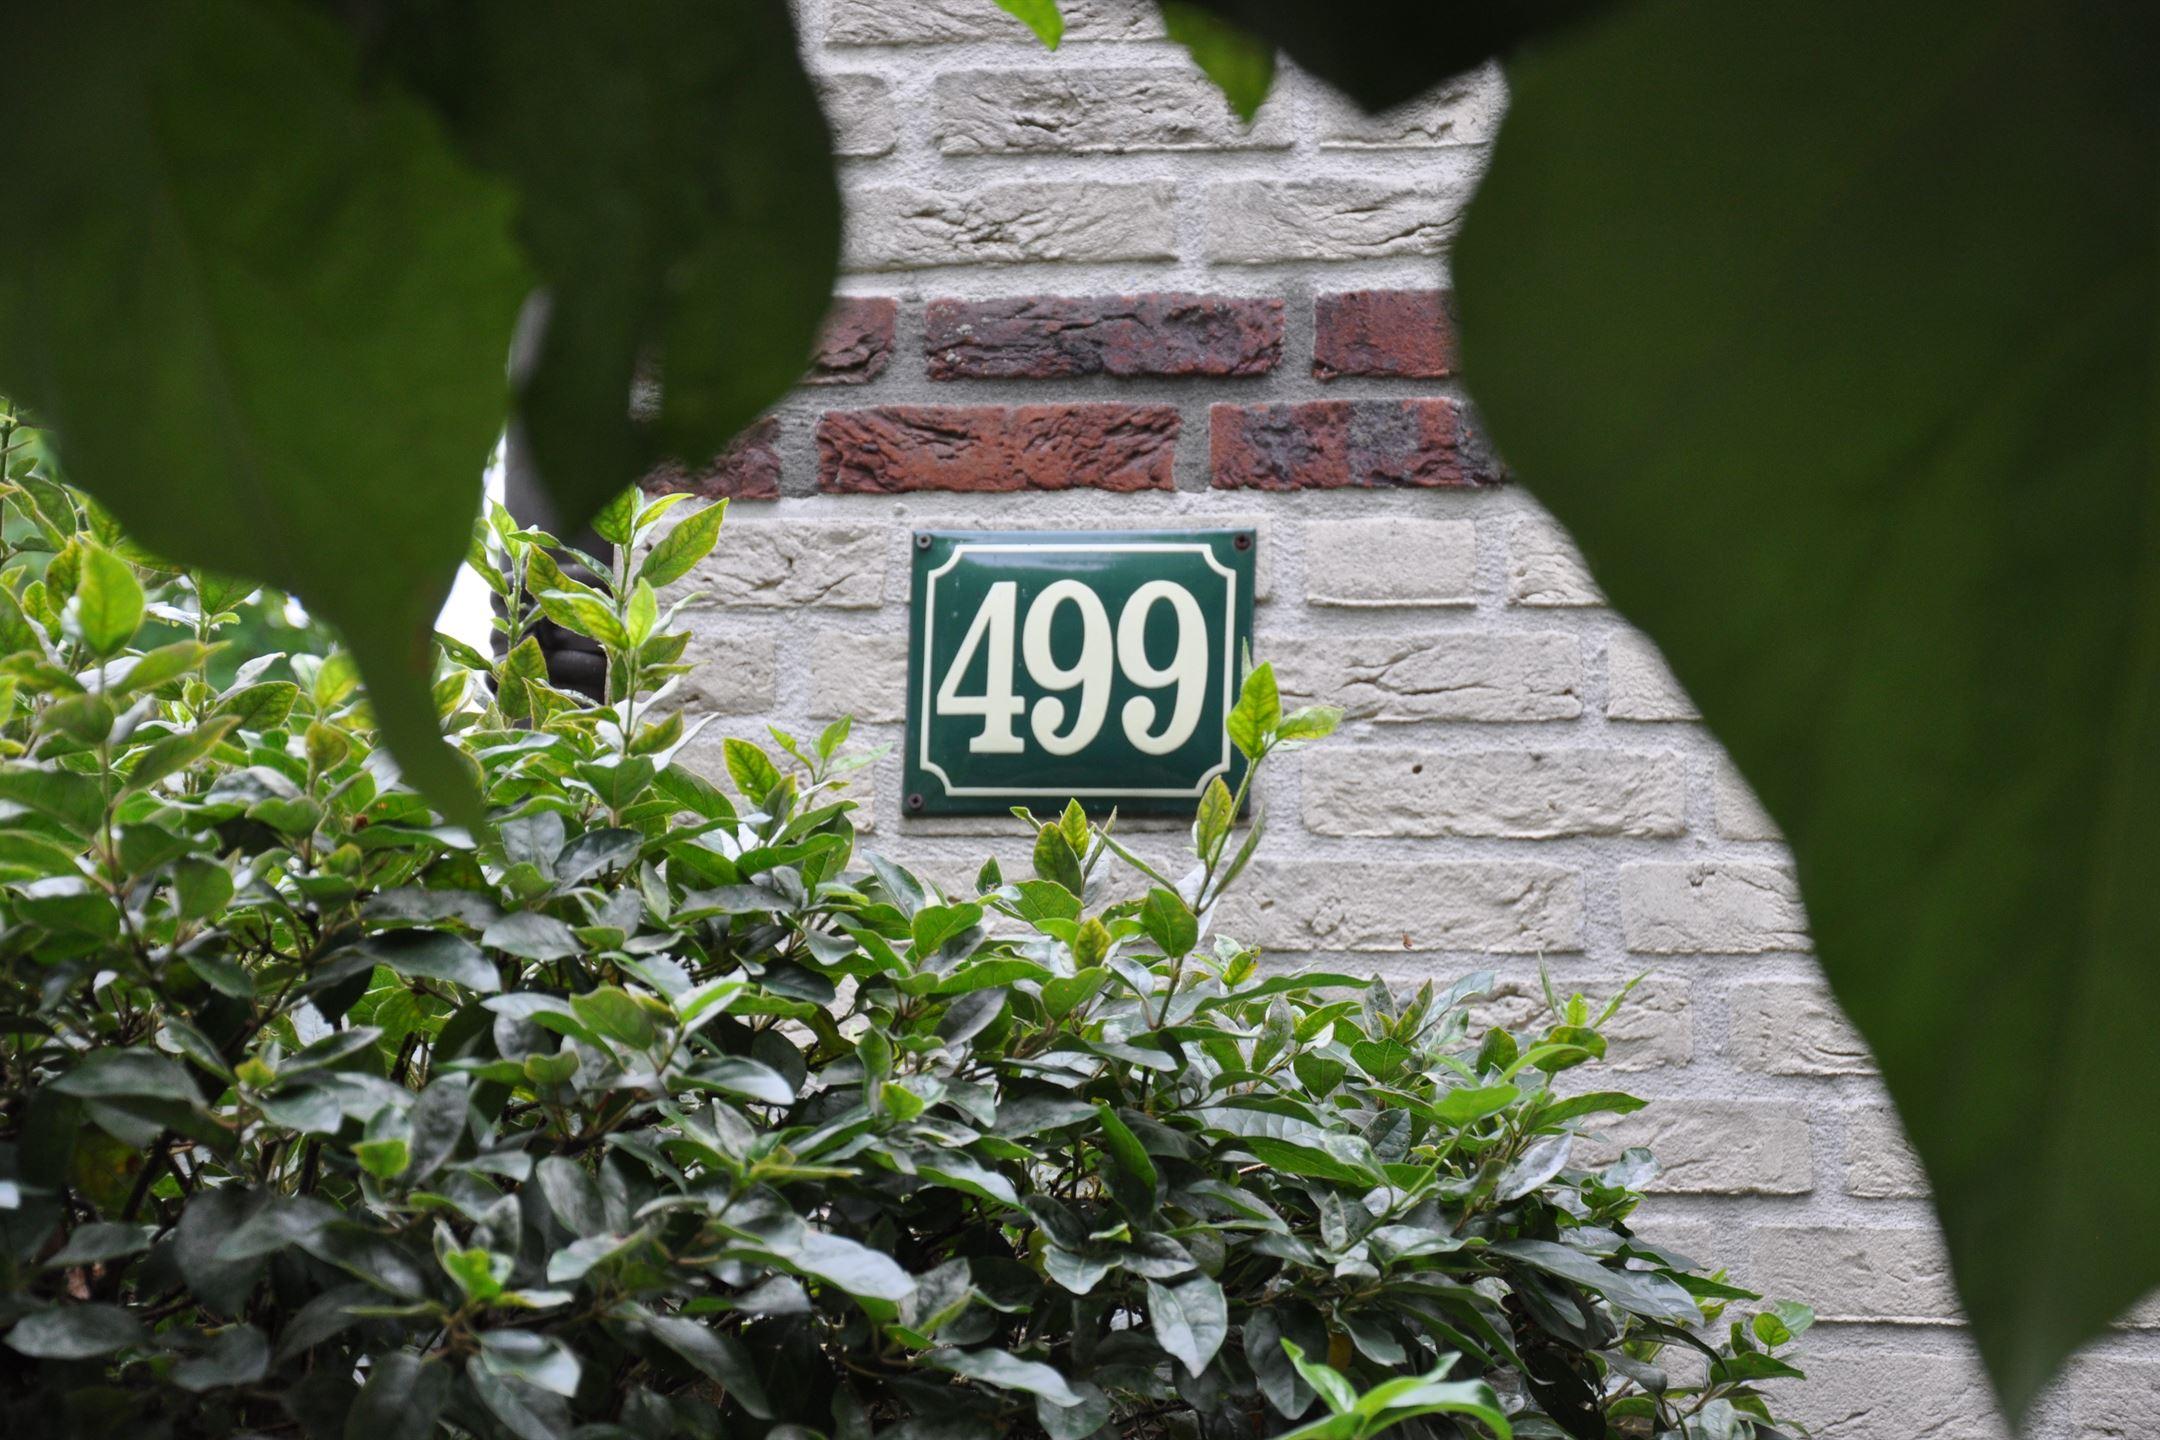 Huis te koop hatertseweg 499 6533 gj nijmegen funda for Woning te koop nijmegen